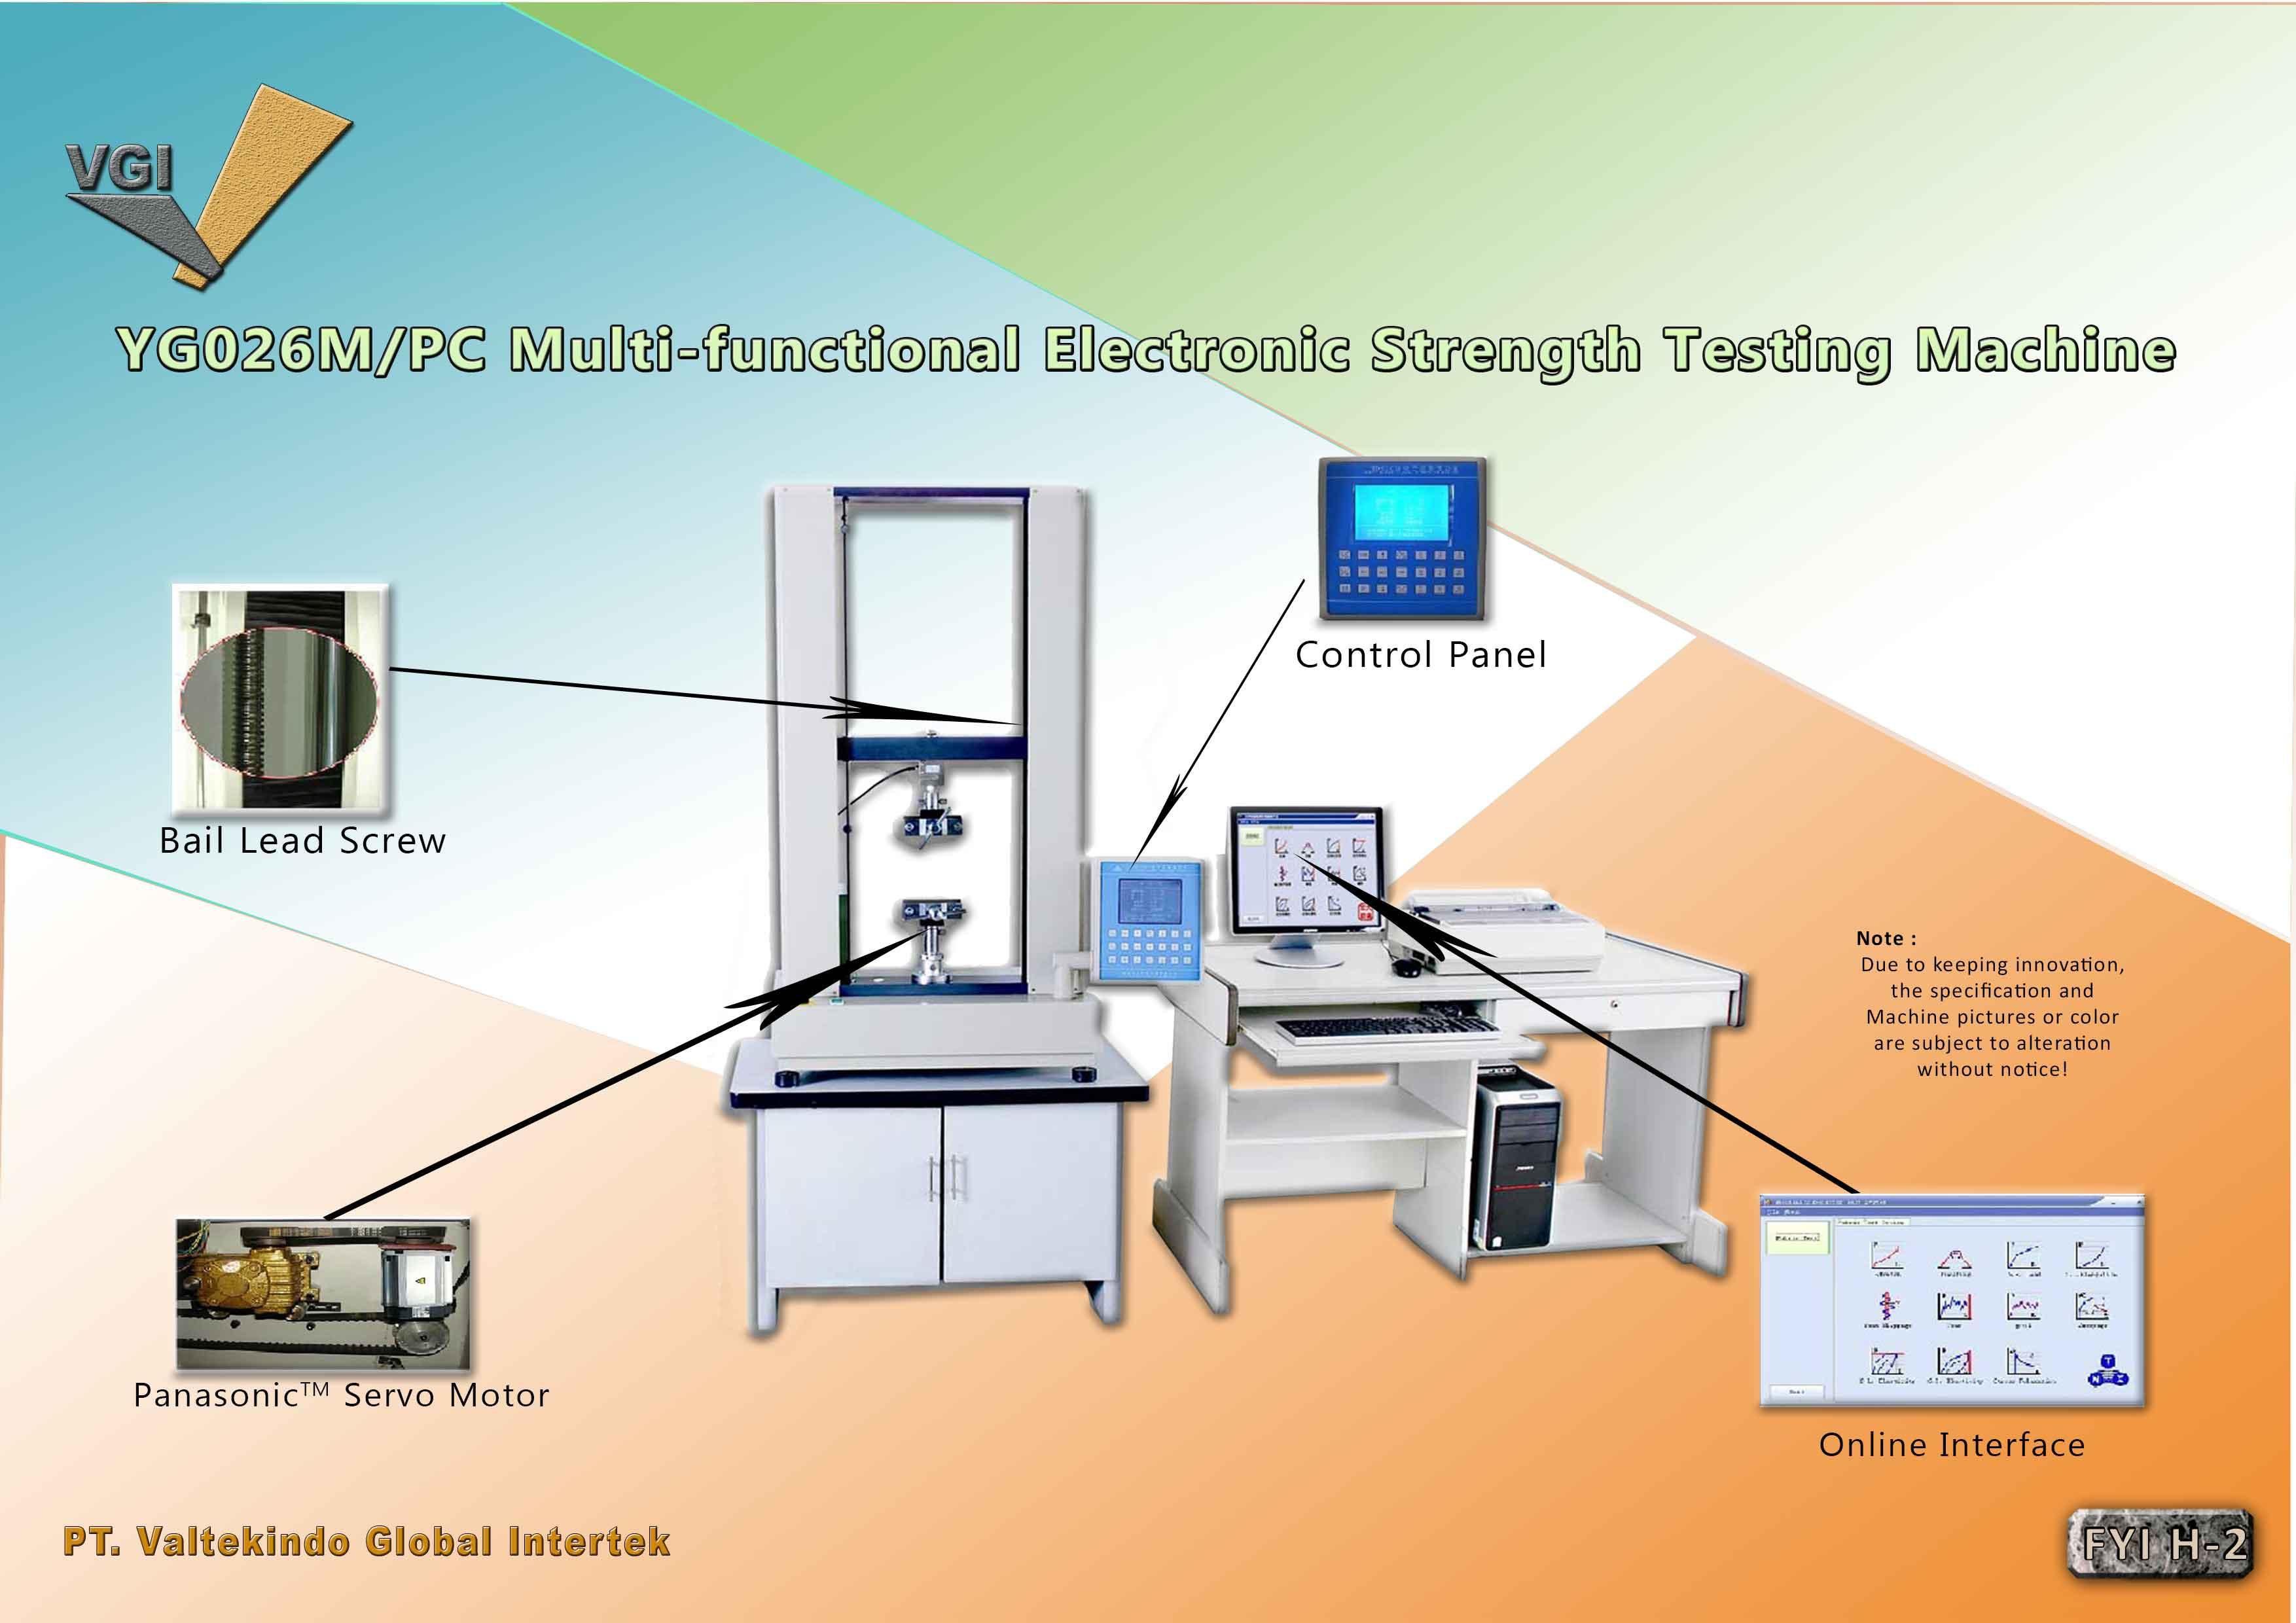 jual mesin Multi Functional Electronic Strength Testing Machine Multi Functional Electronic Strength Testing Machine